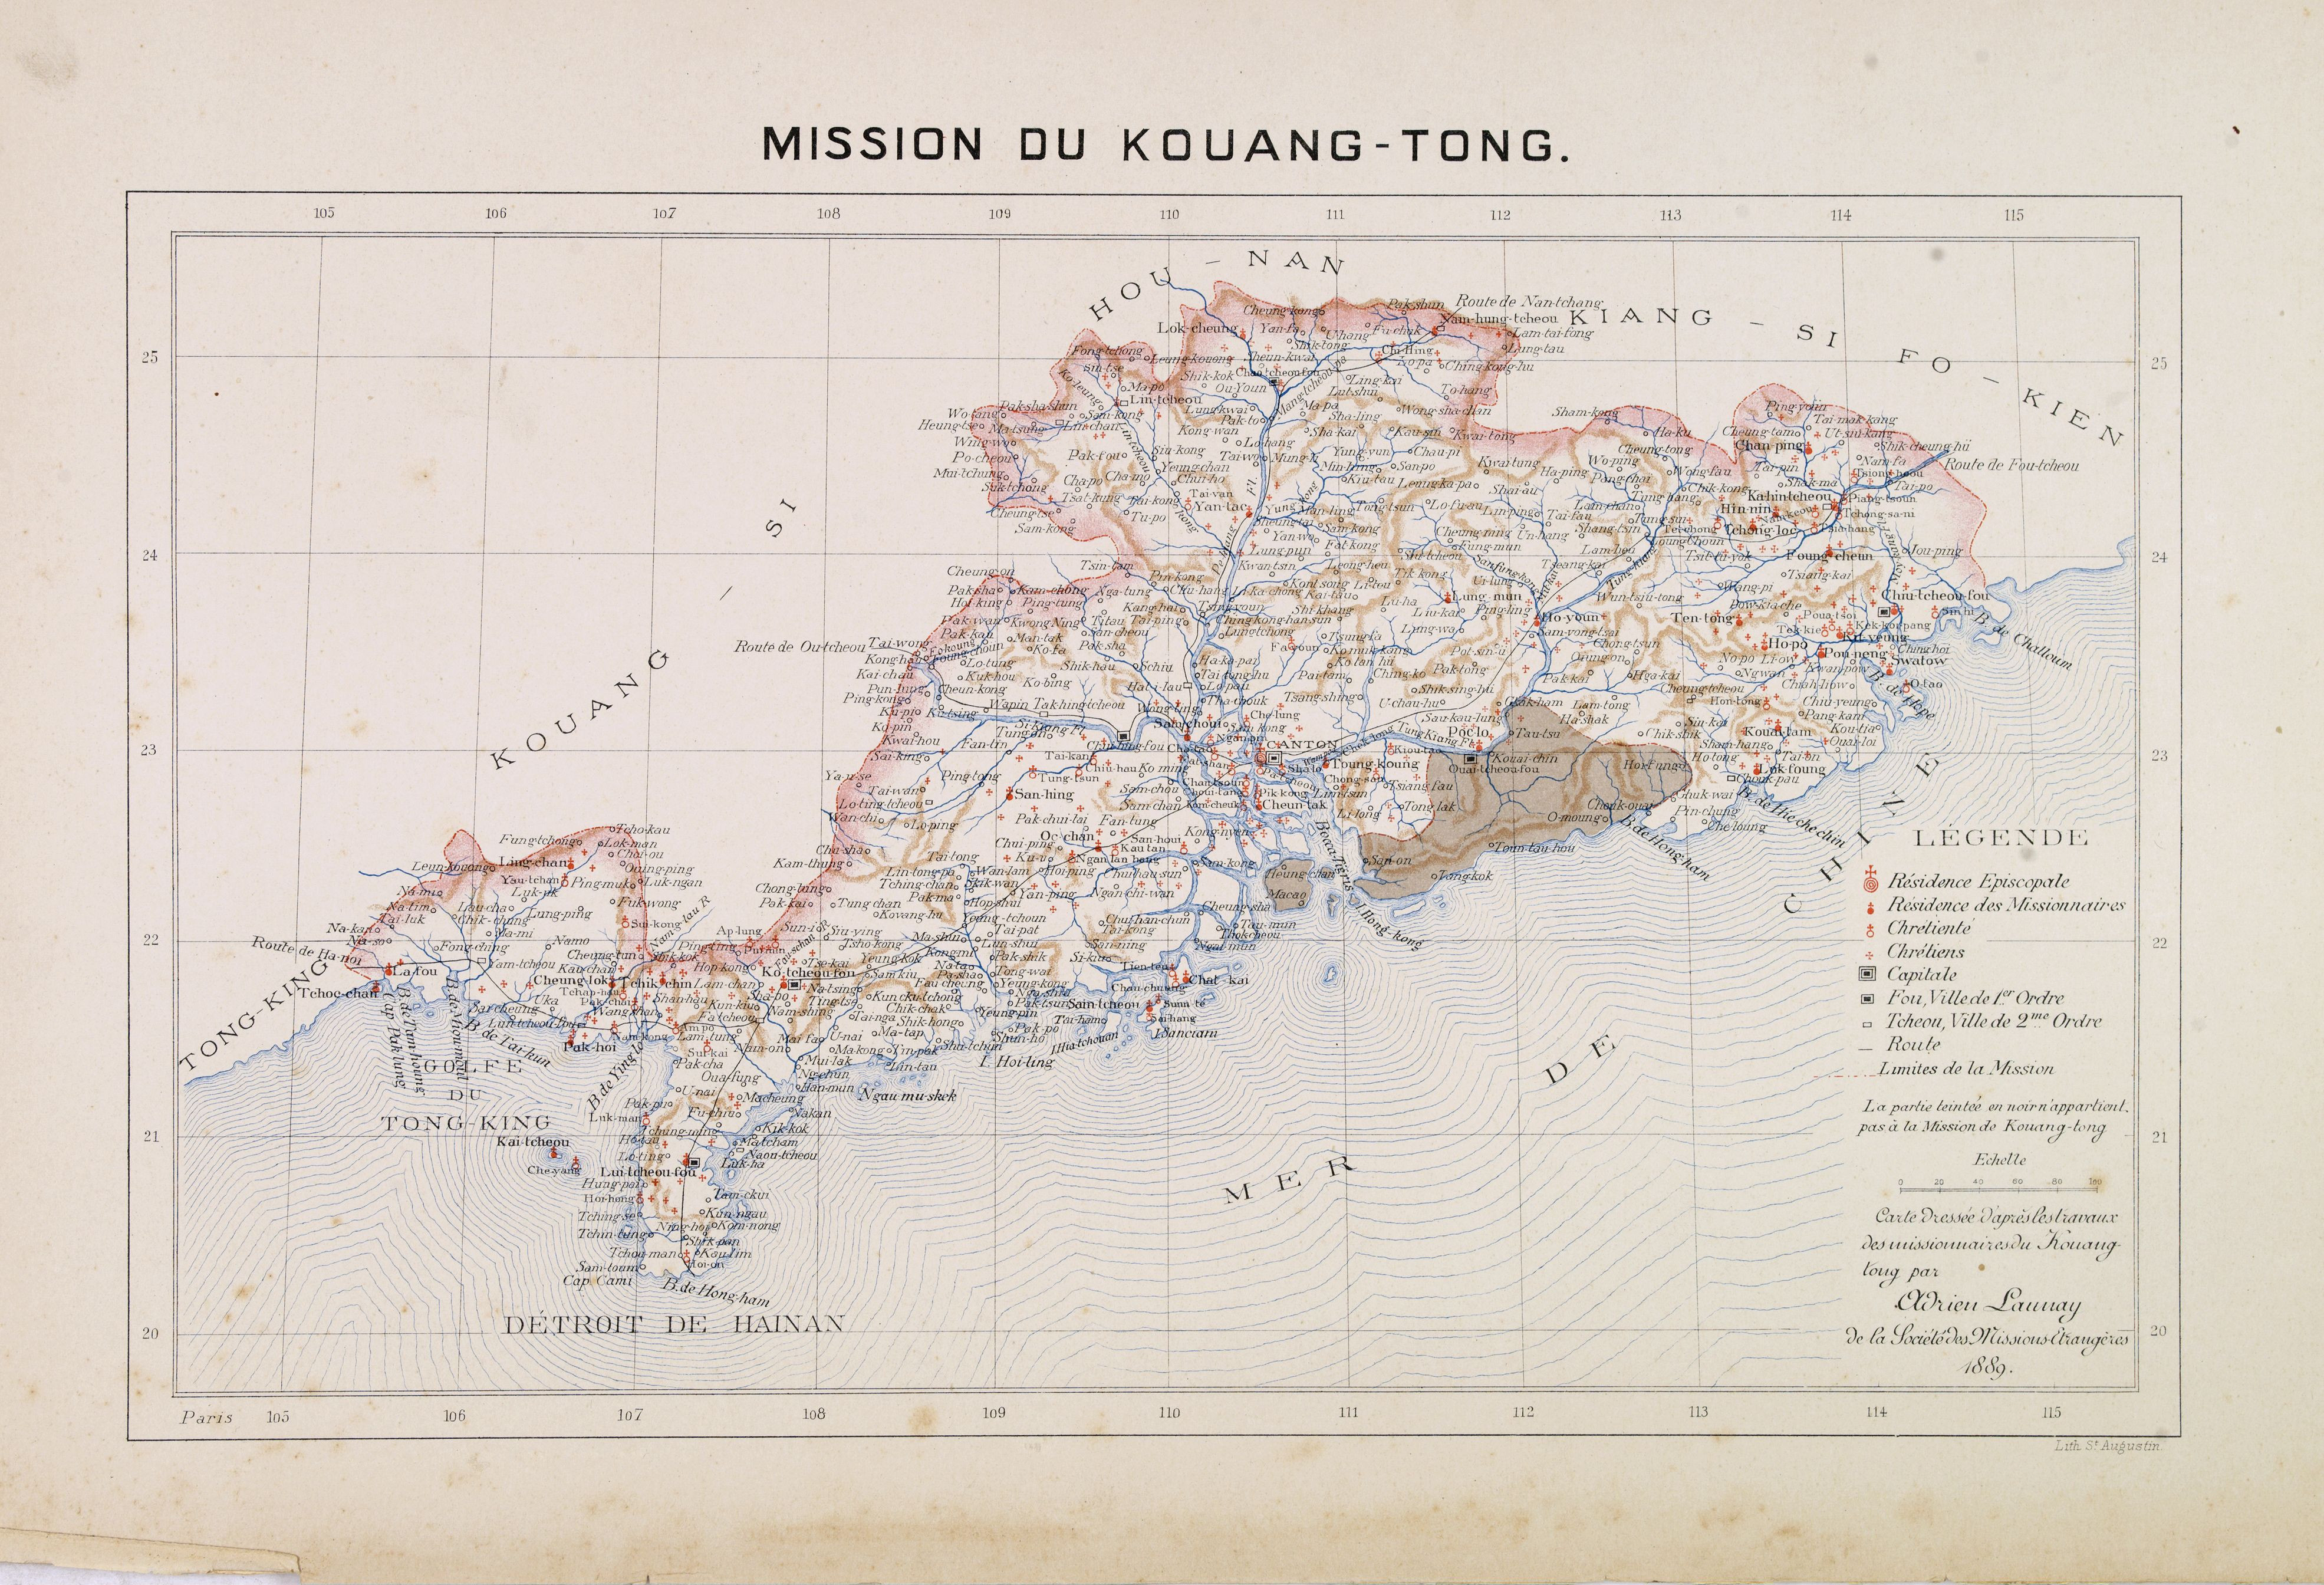 Devils Lake Nd >> File:Map of Guangdong Province, China, 1889.jpg ...